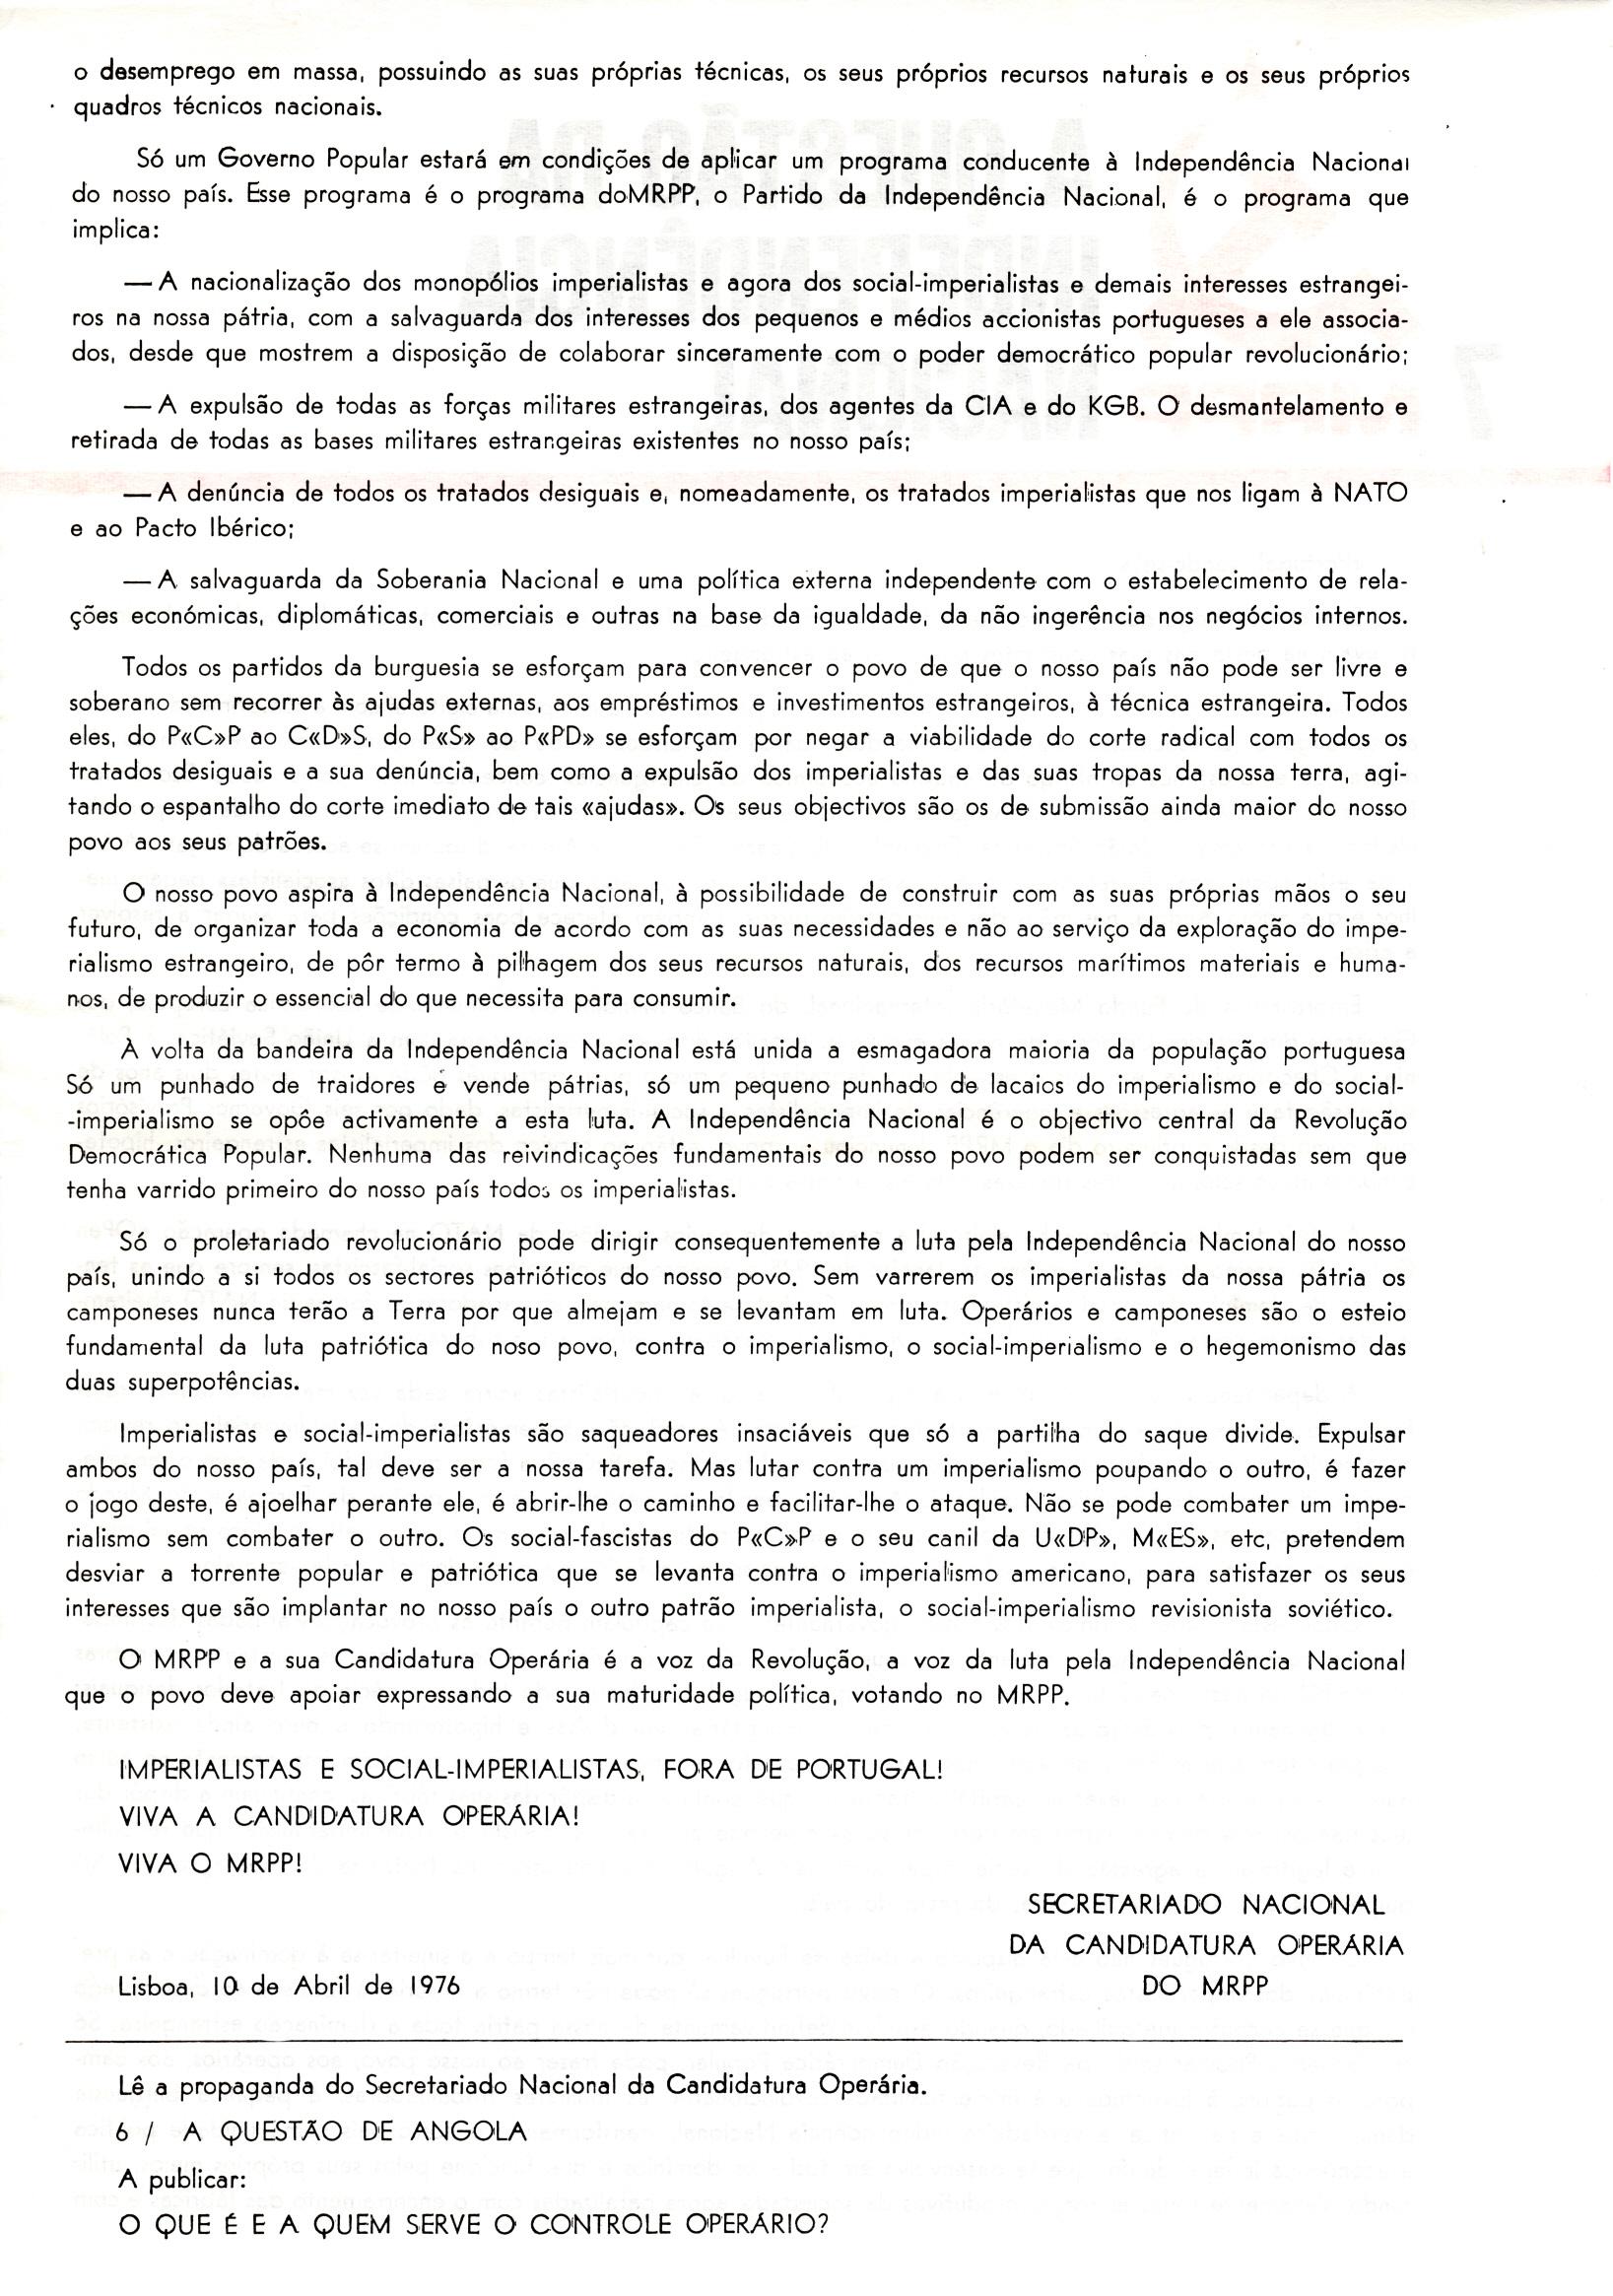 mrpp_1976_eleicao_programa_0014